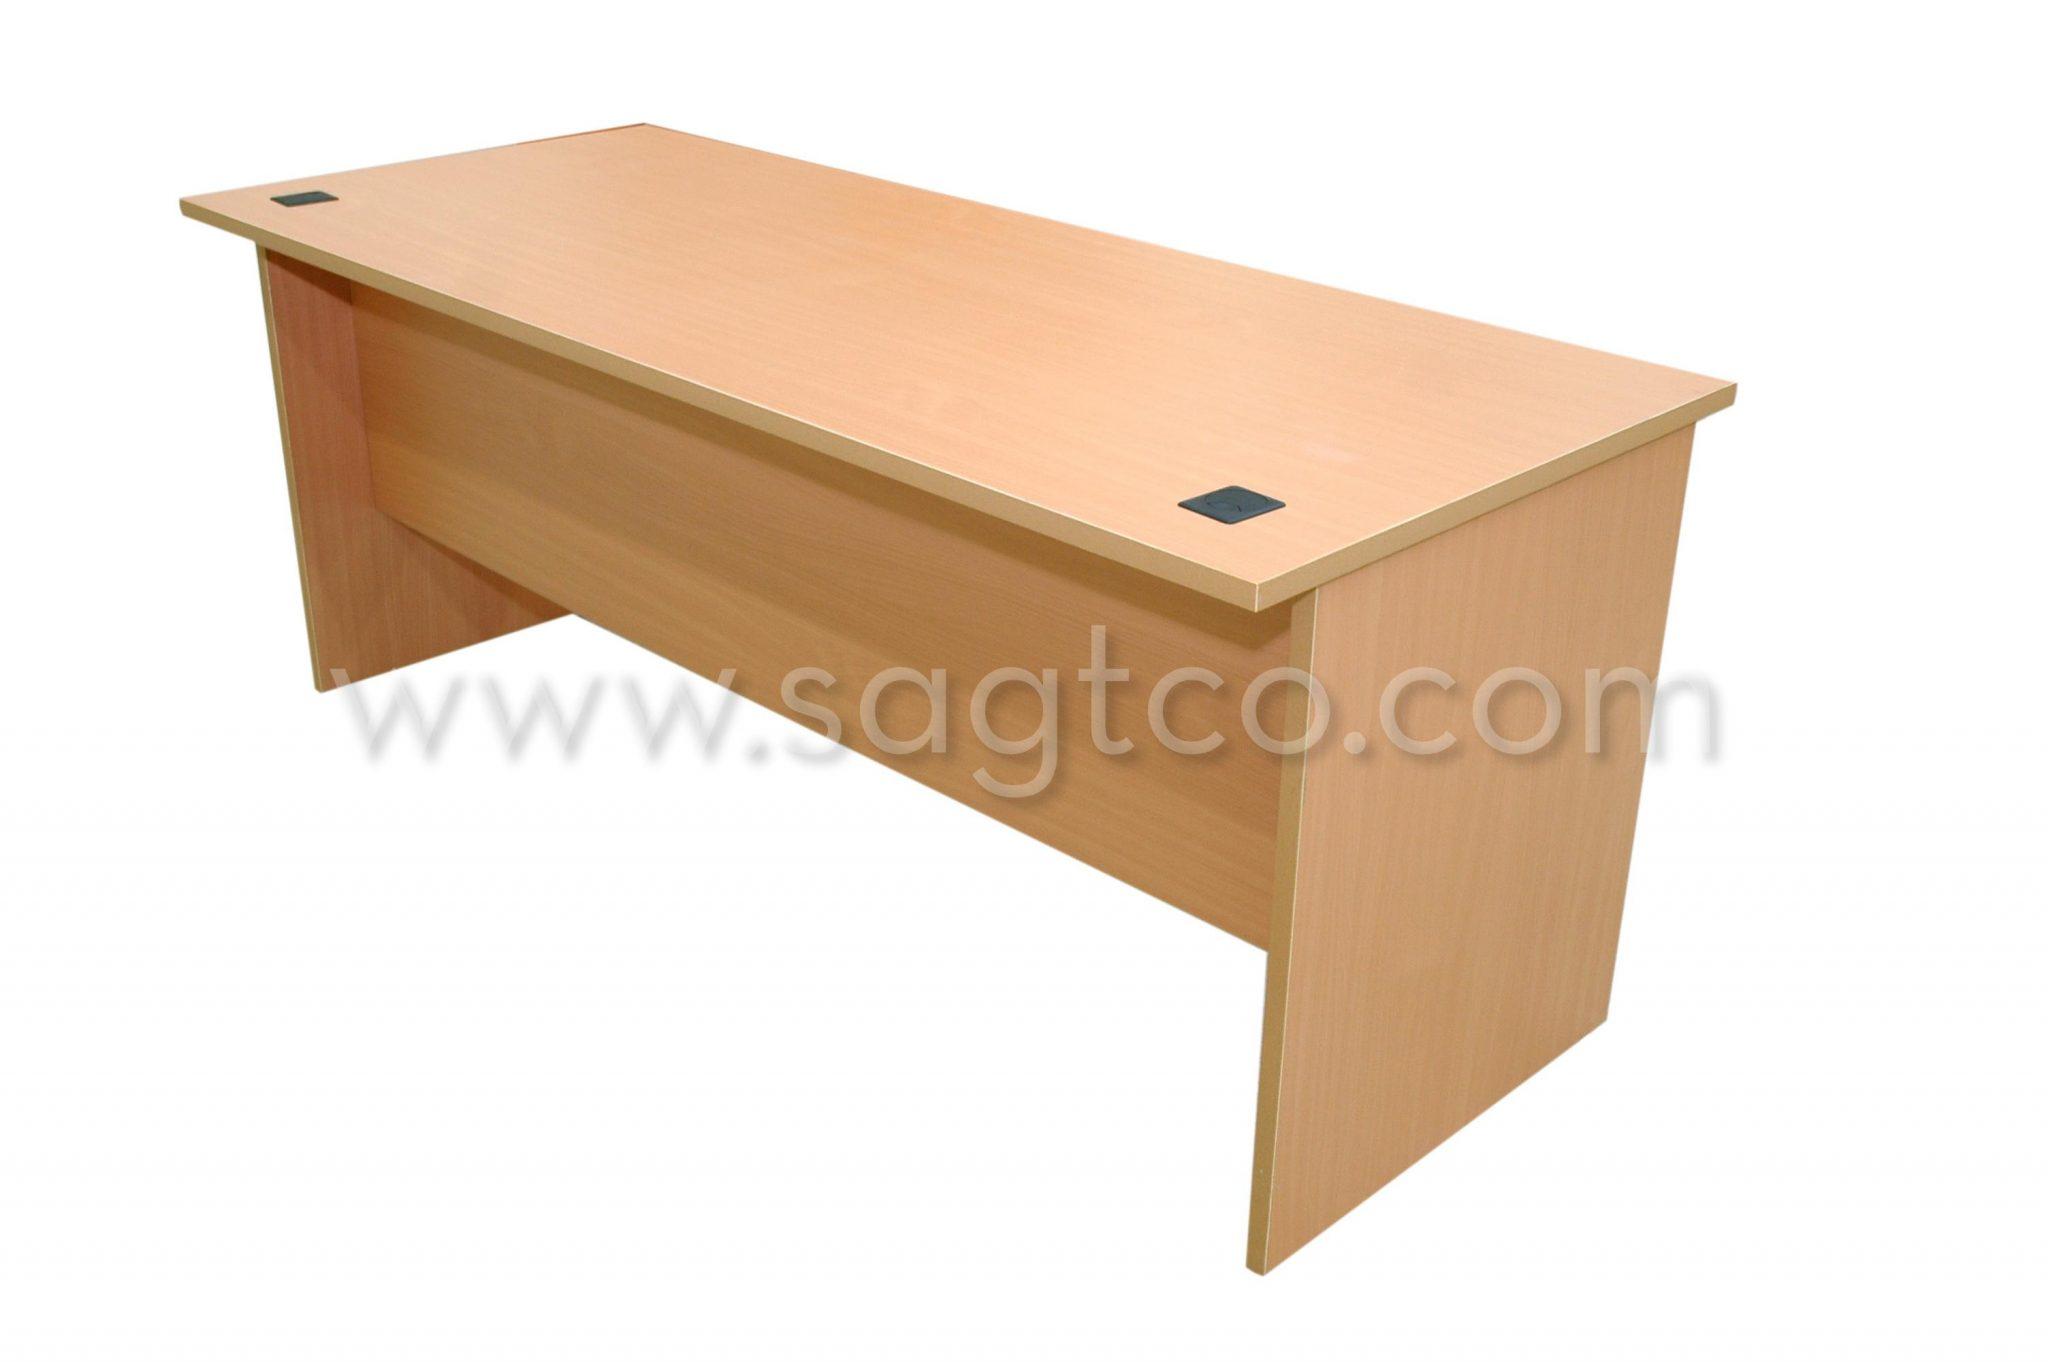 Office Table Beech Color 180cmLx75cmW A